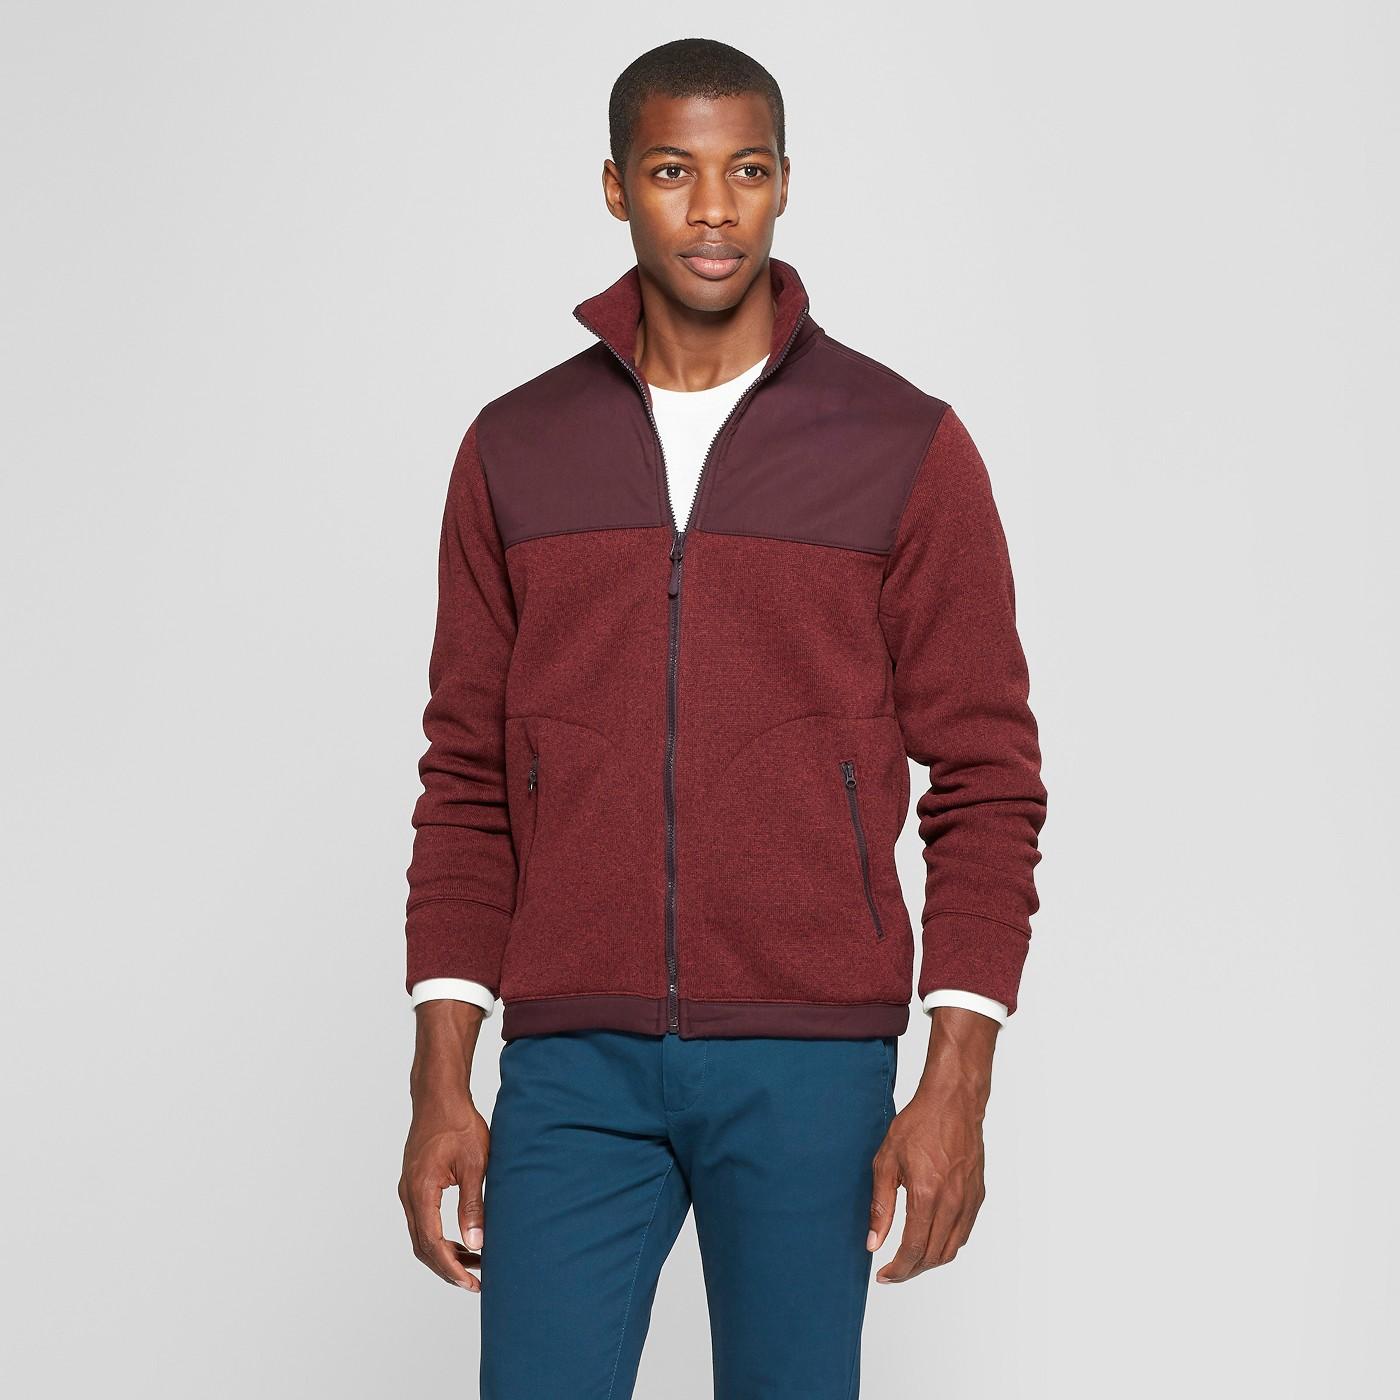 Men's Standard Fit Long Sleeve Sweater Fleece Zip-Up - Goodfellow & Co™ - image 1 of 3